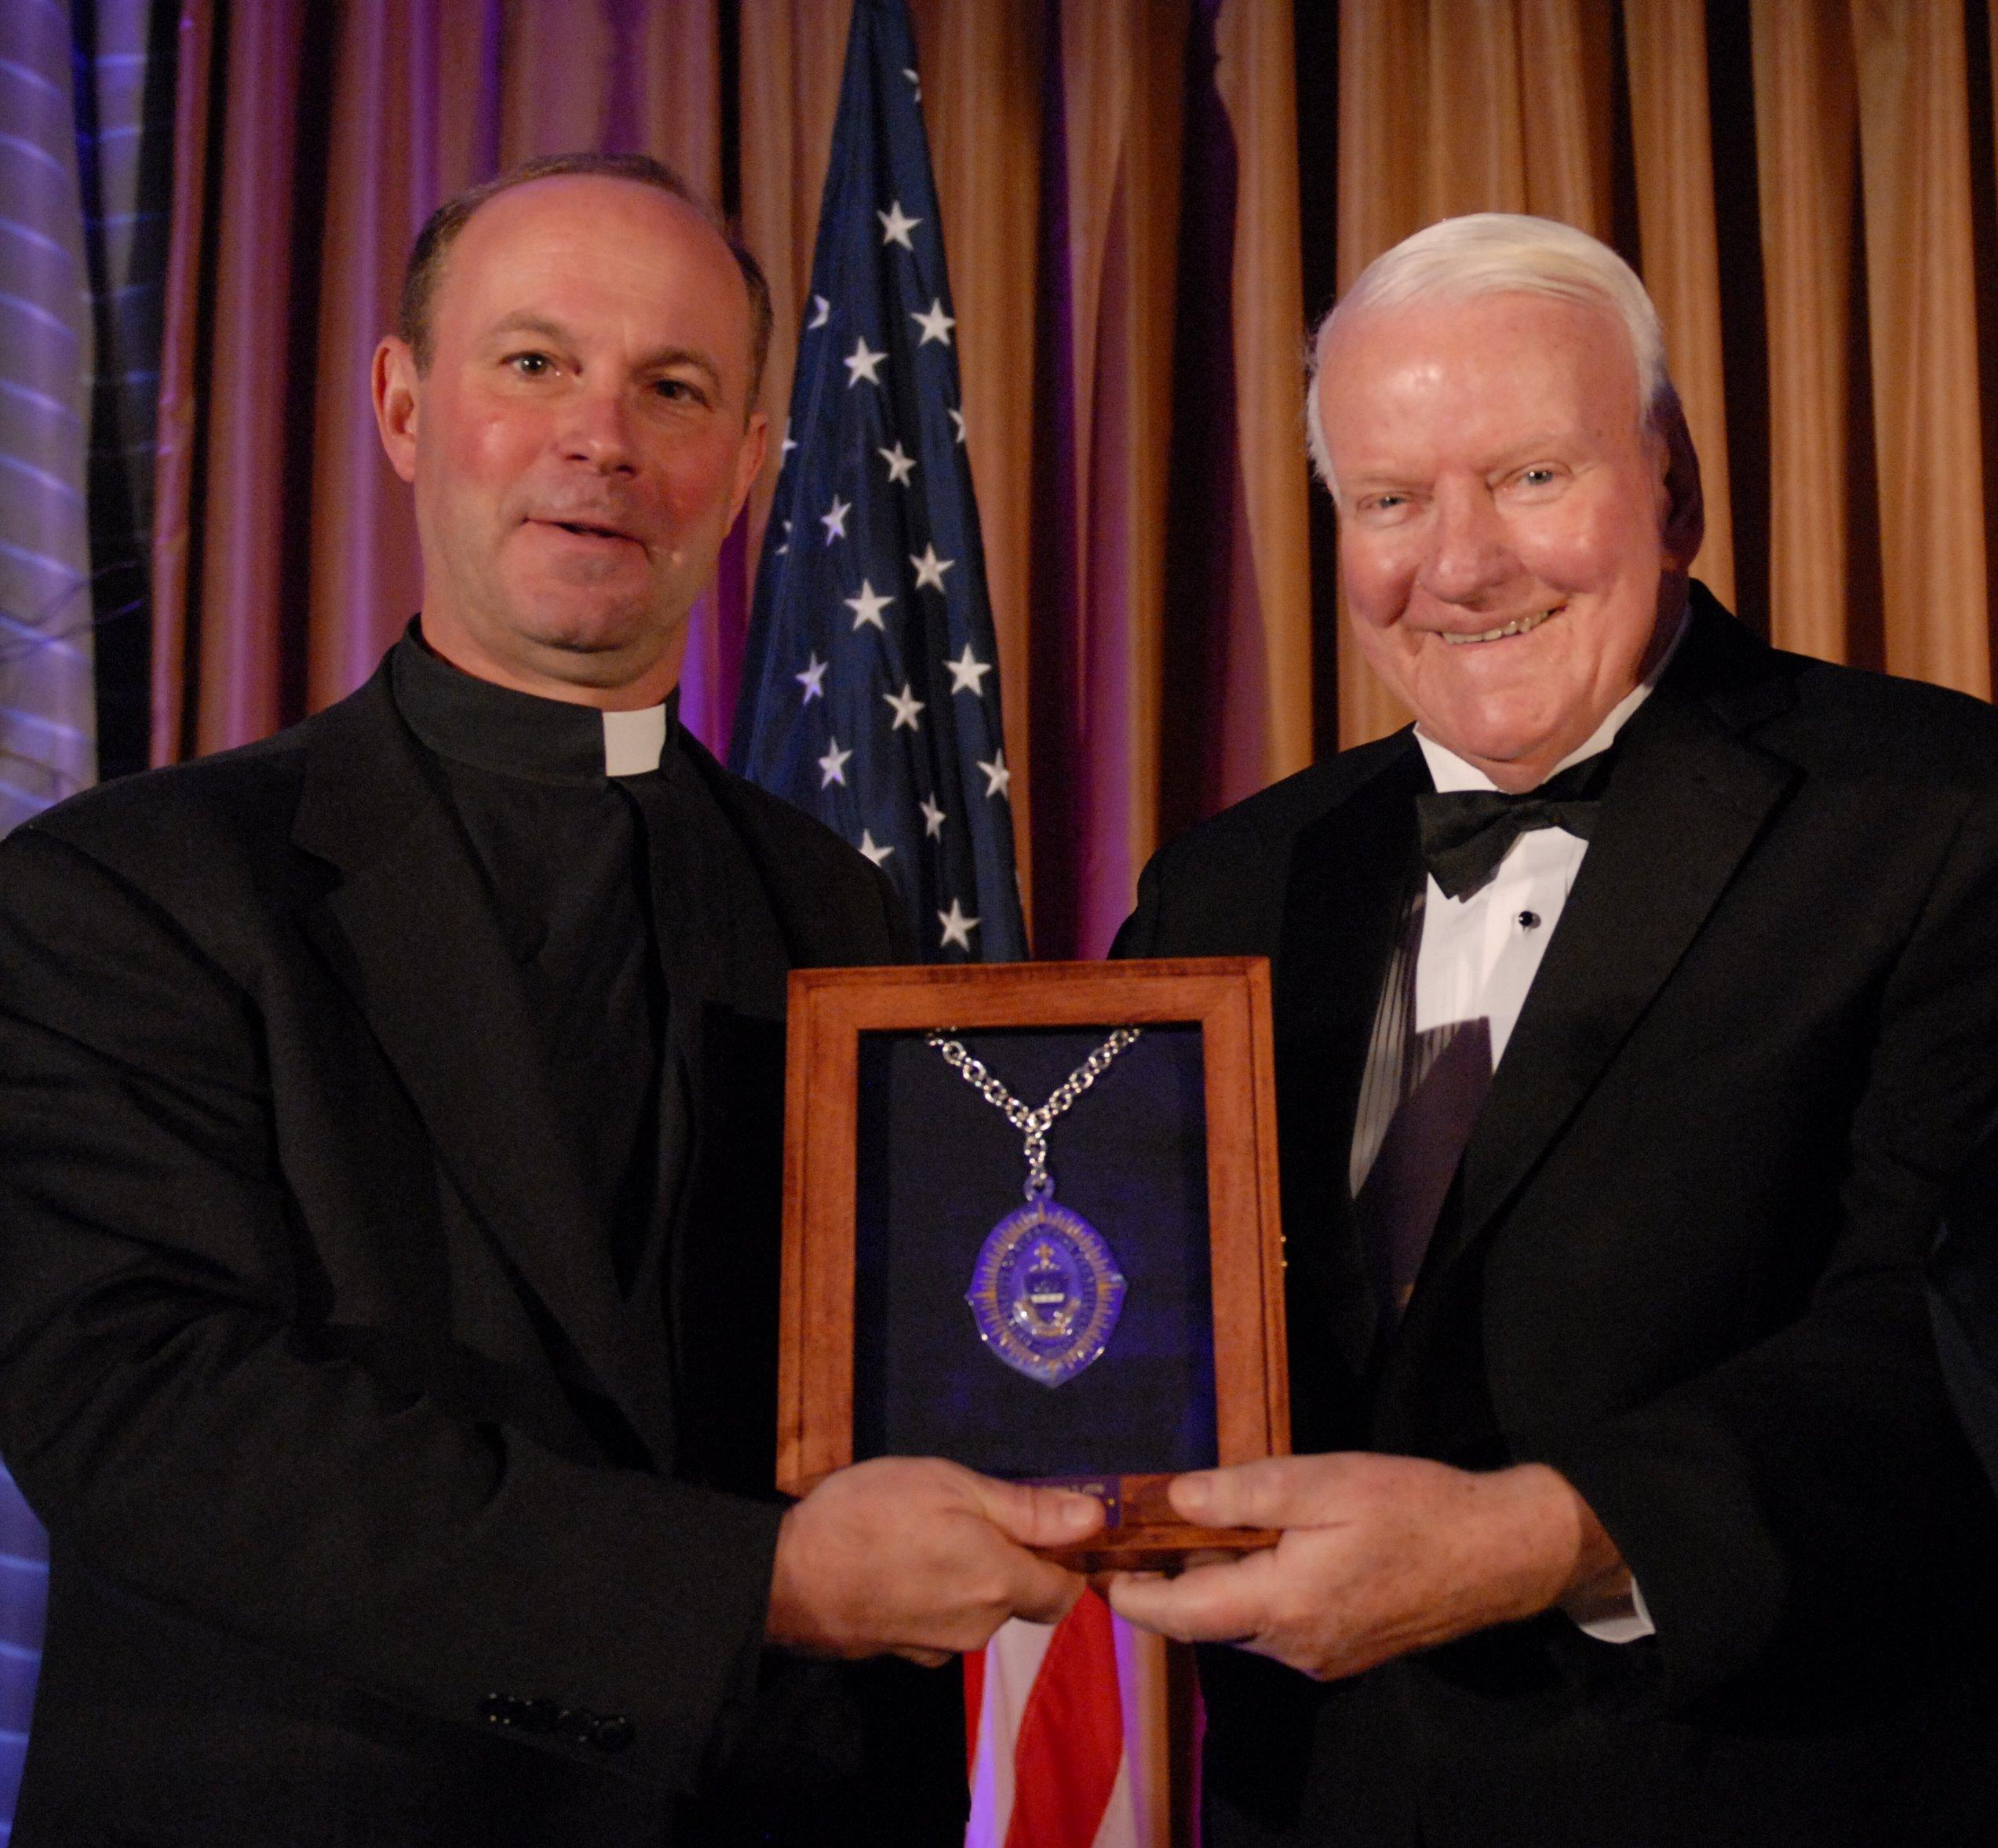 Mr_Kane_receiving_medal-1.jpg